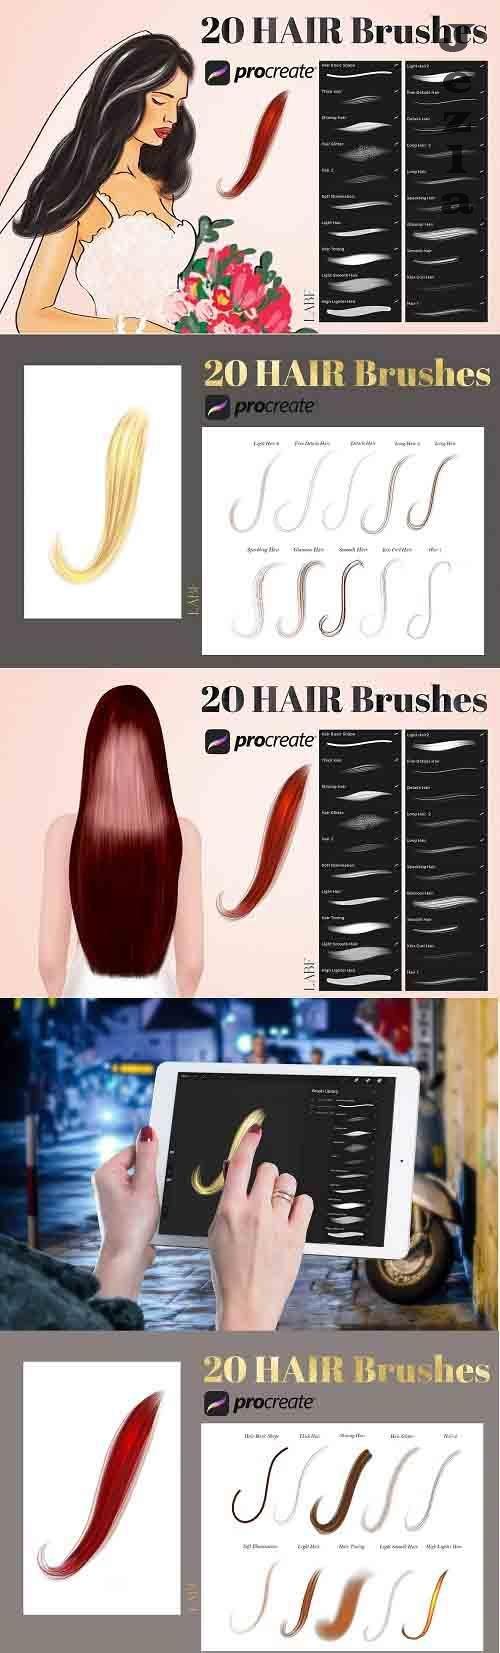 20 Procreate Hair Brushes - 6179058